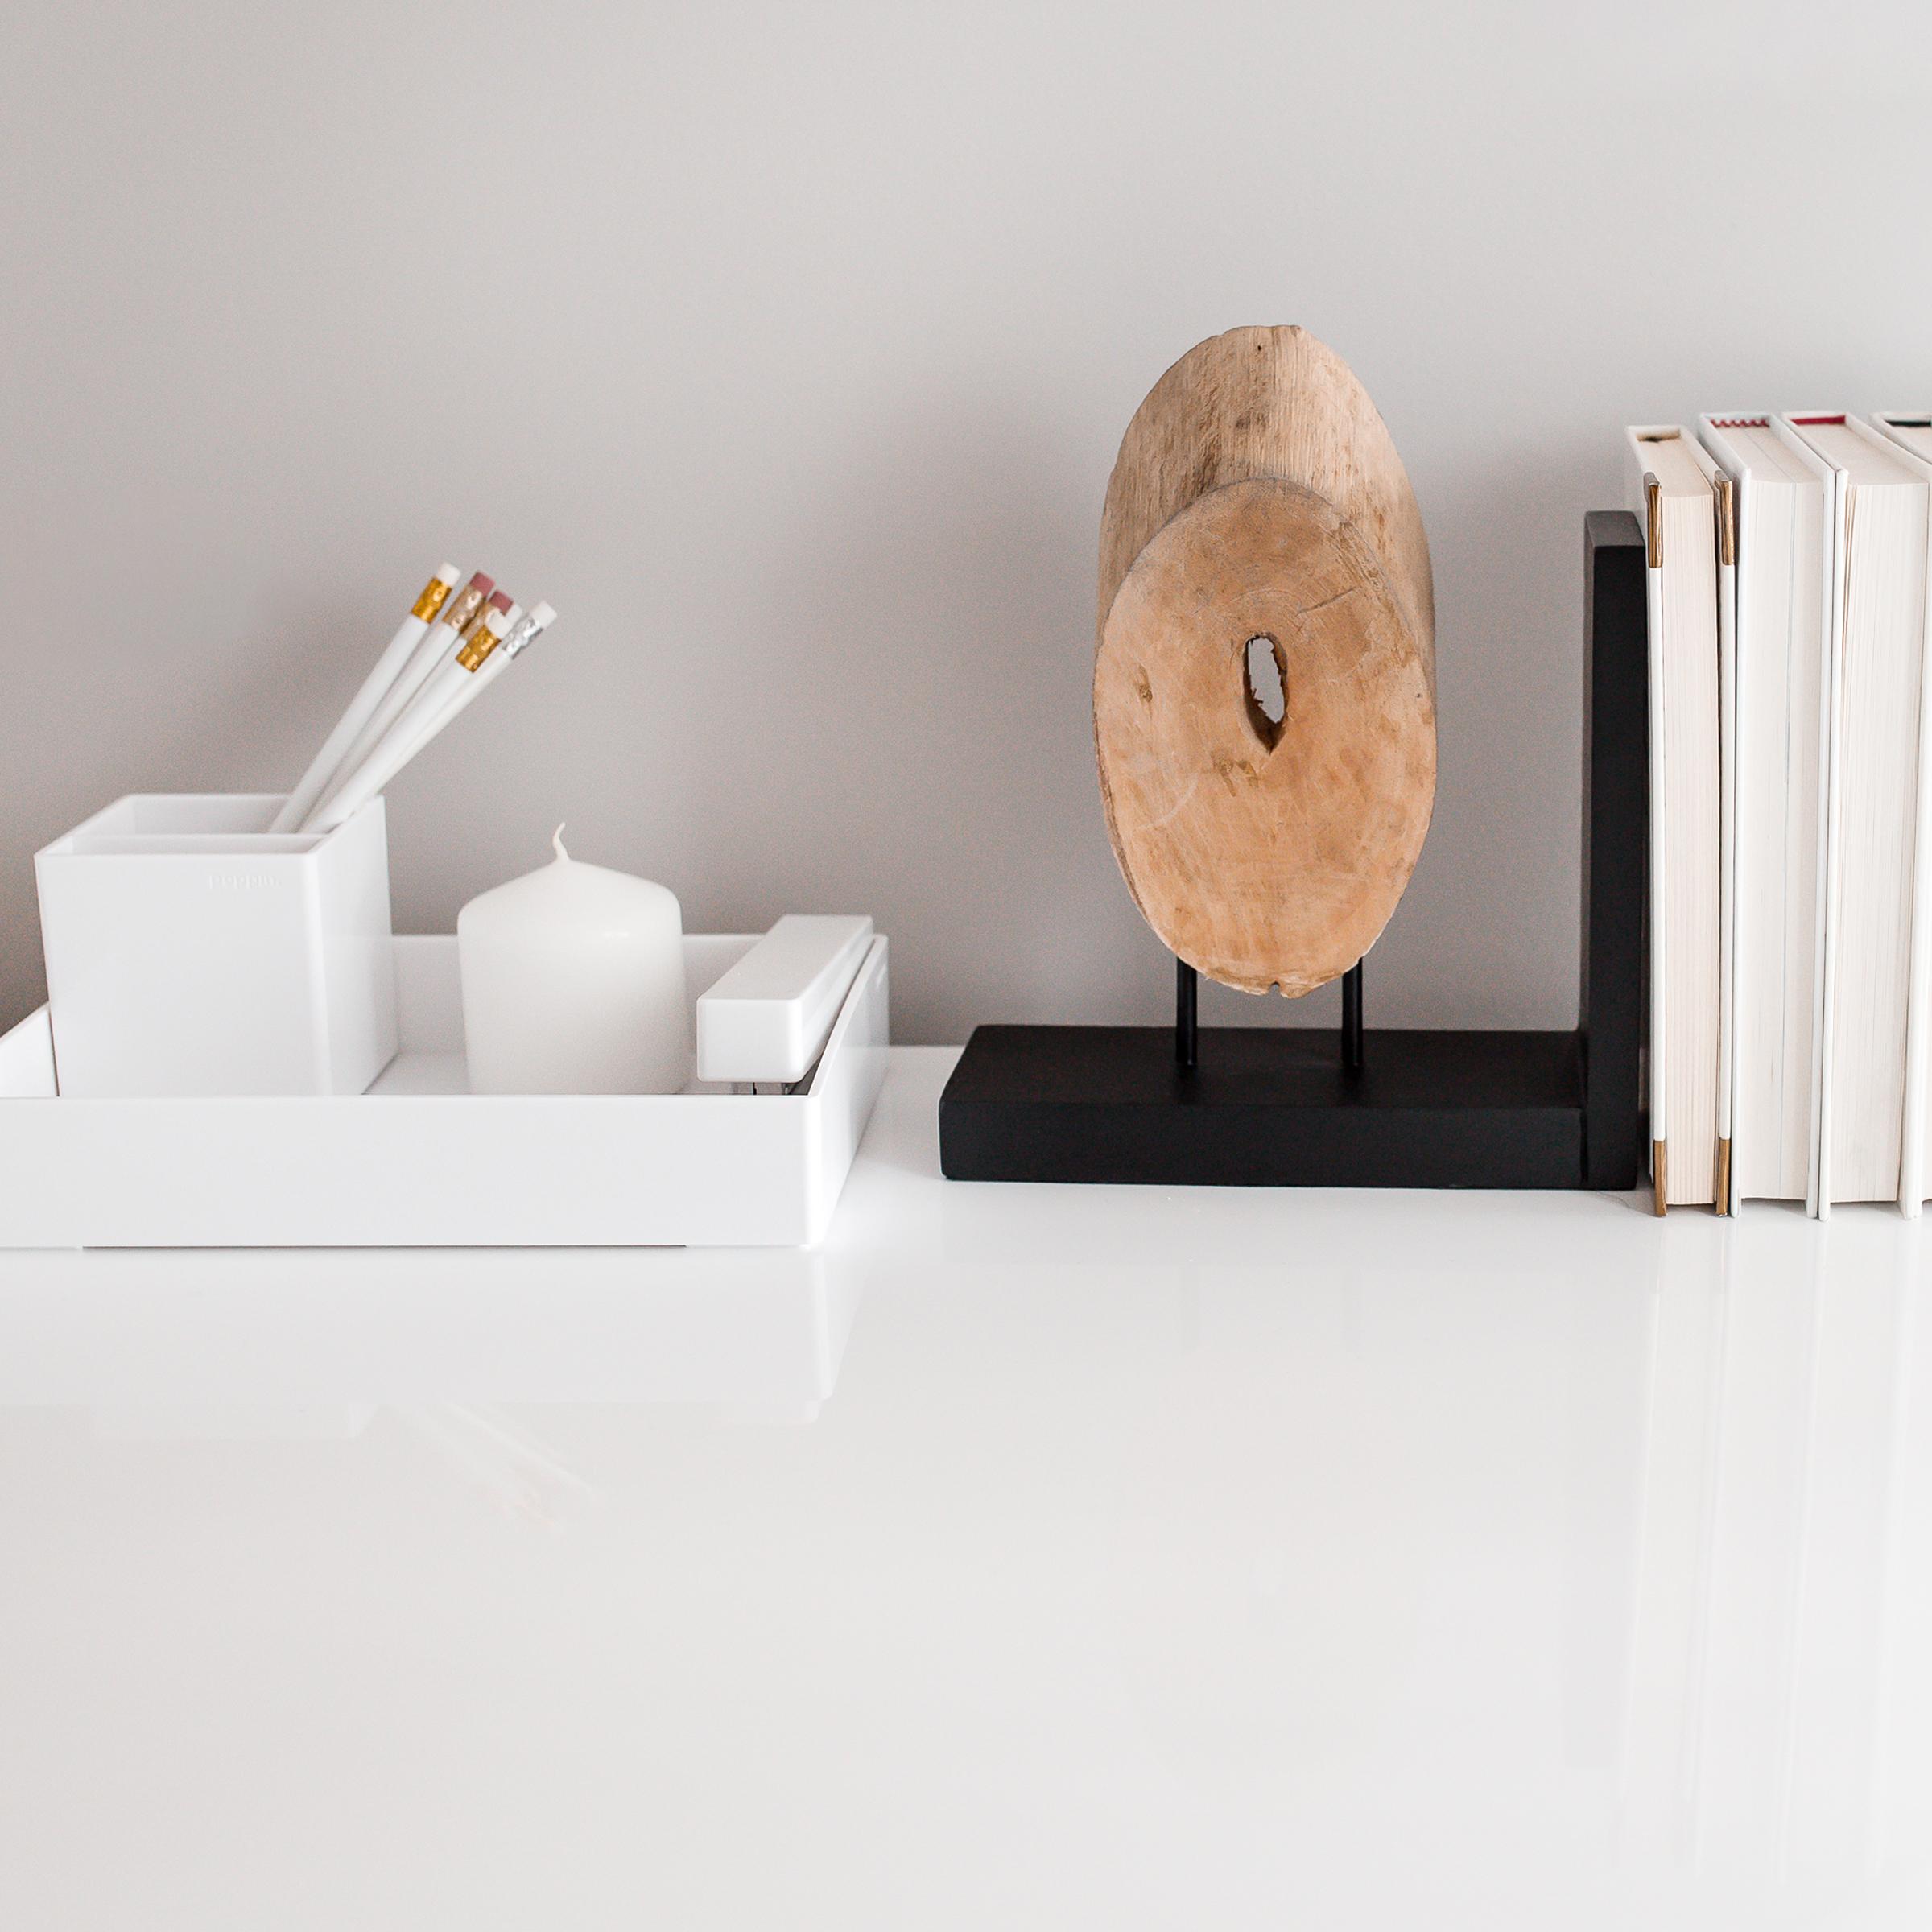 haute-stock-photography-neutral-home-interior-final-21